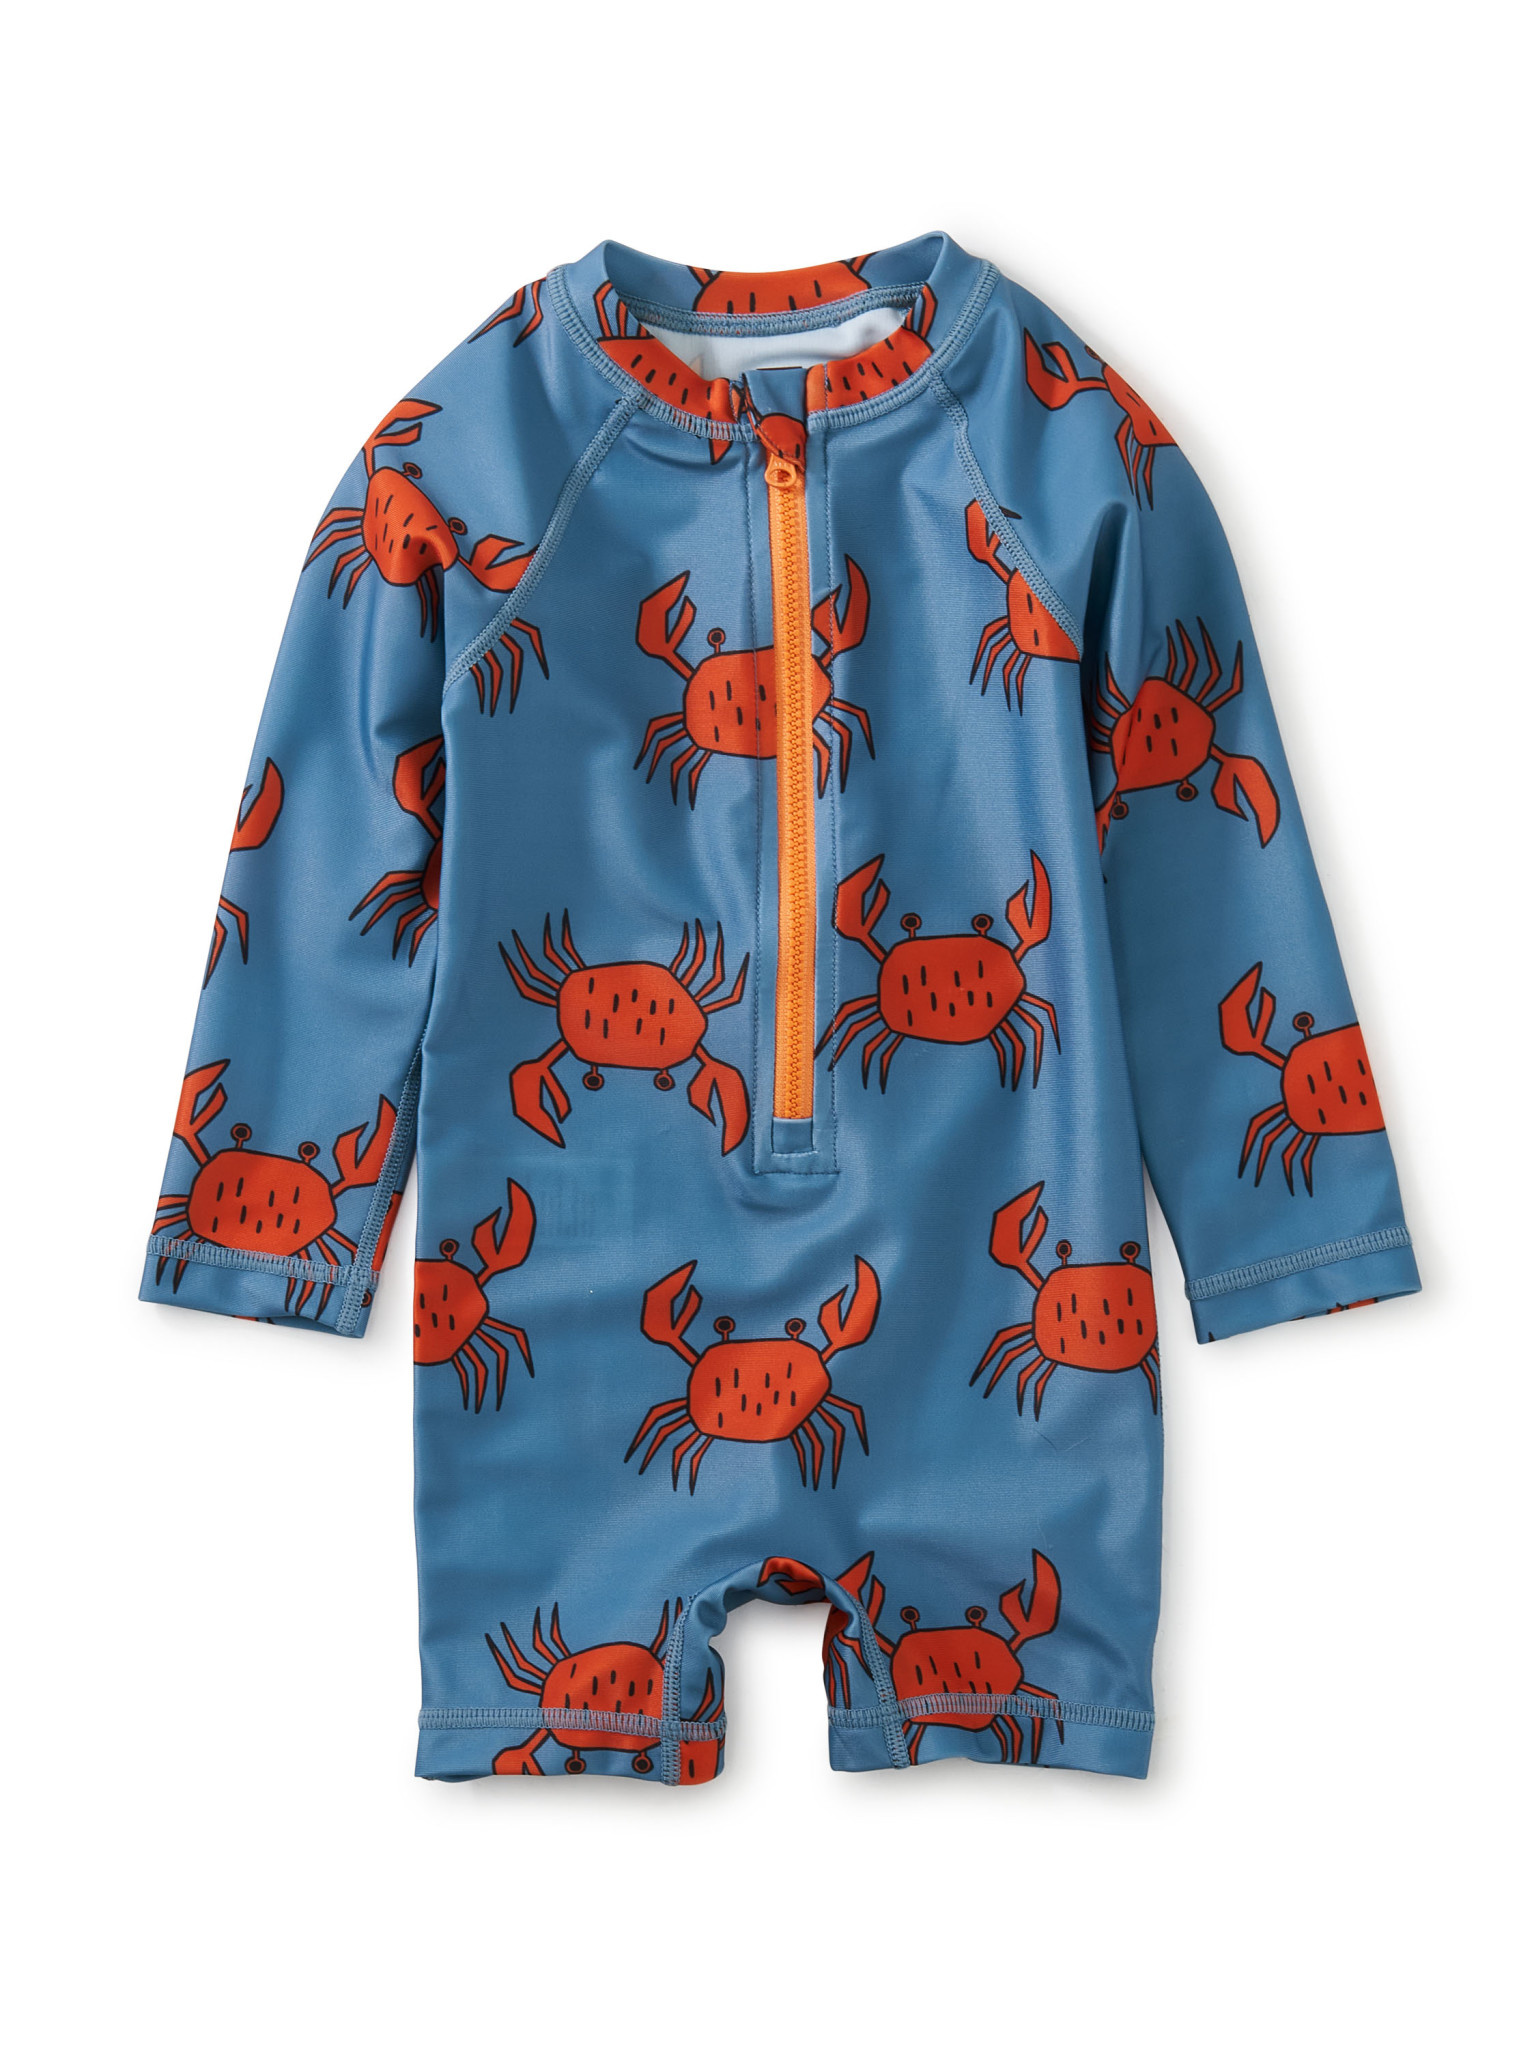 Tea Collection Rash Guard Baby Swimsuit- Dancing